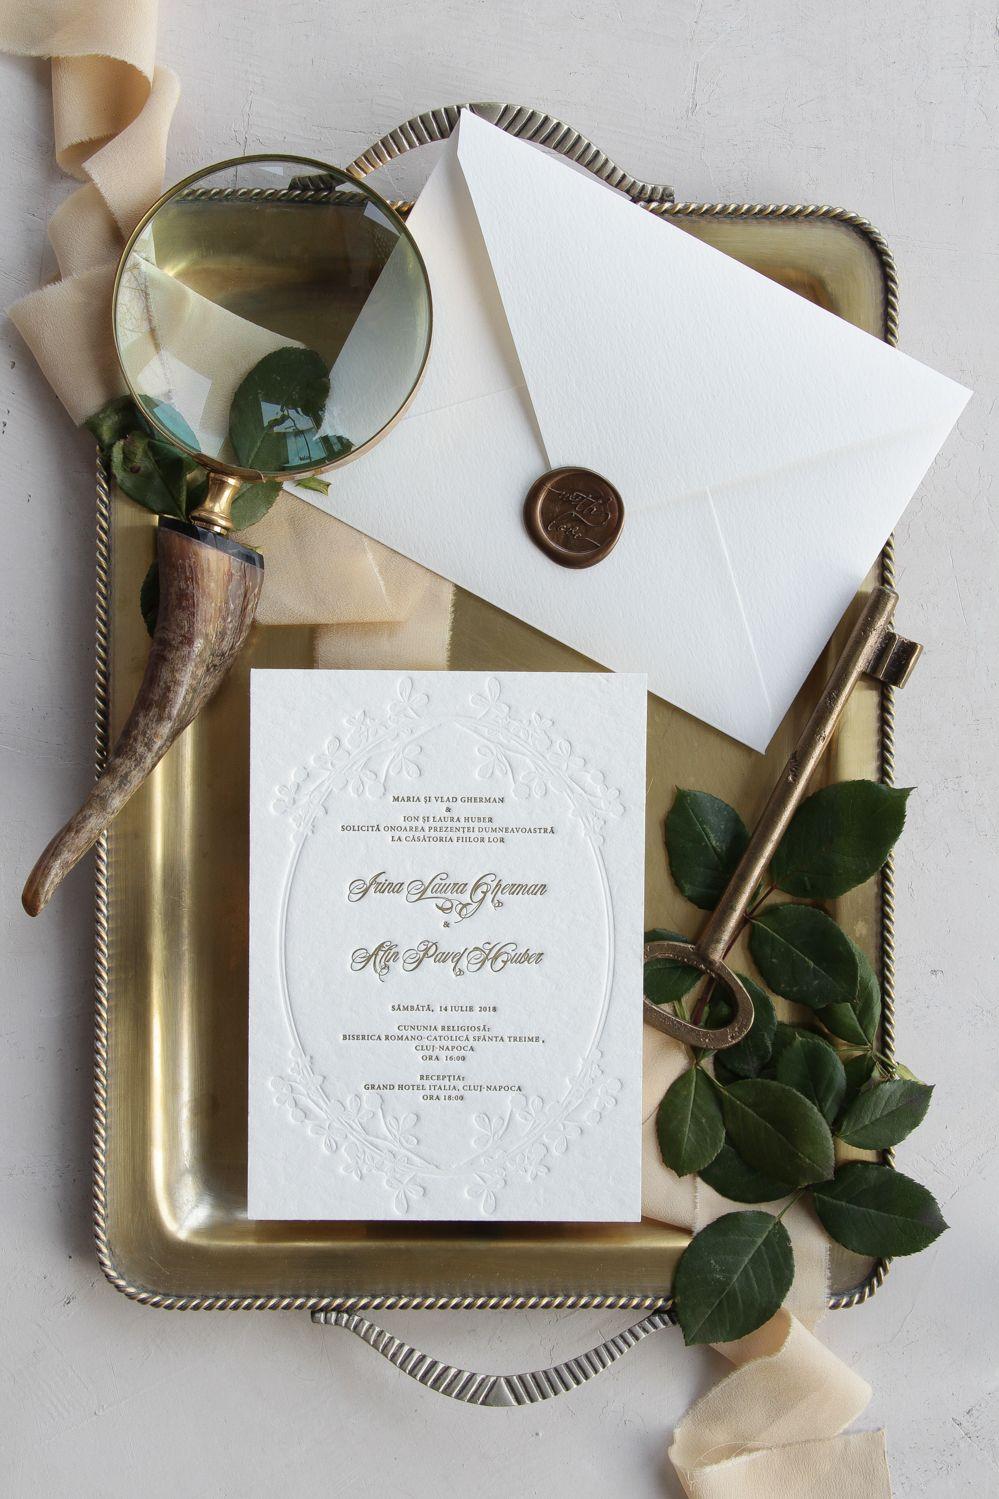 Invitatie Letterpress Irinaalin In 2019 2018 Bella Spring Shoot